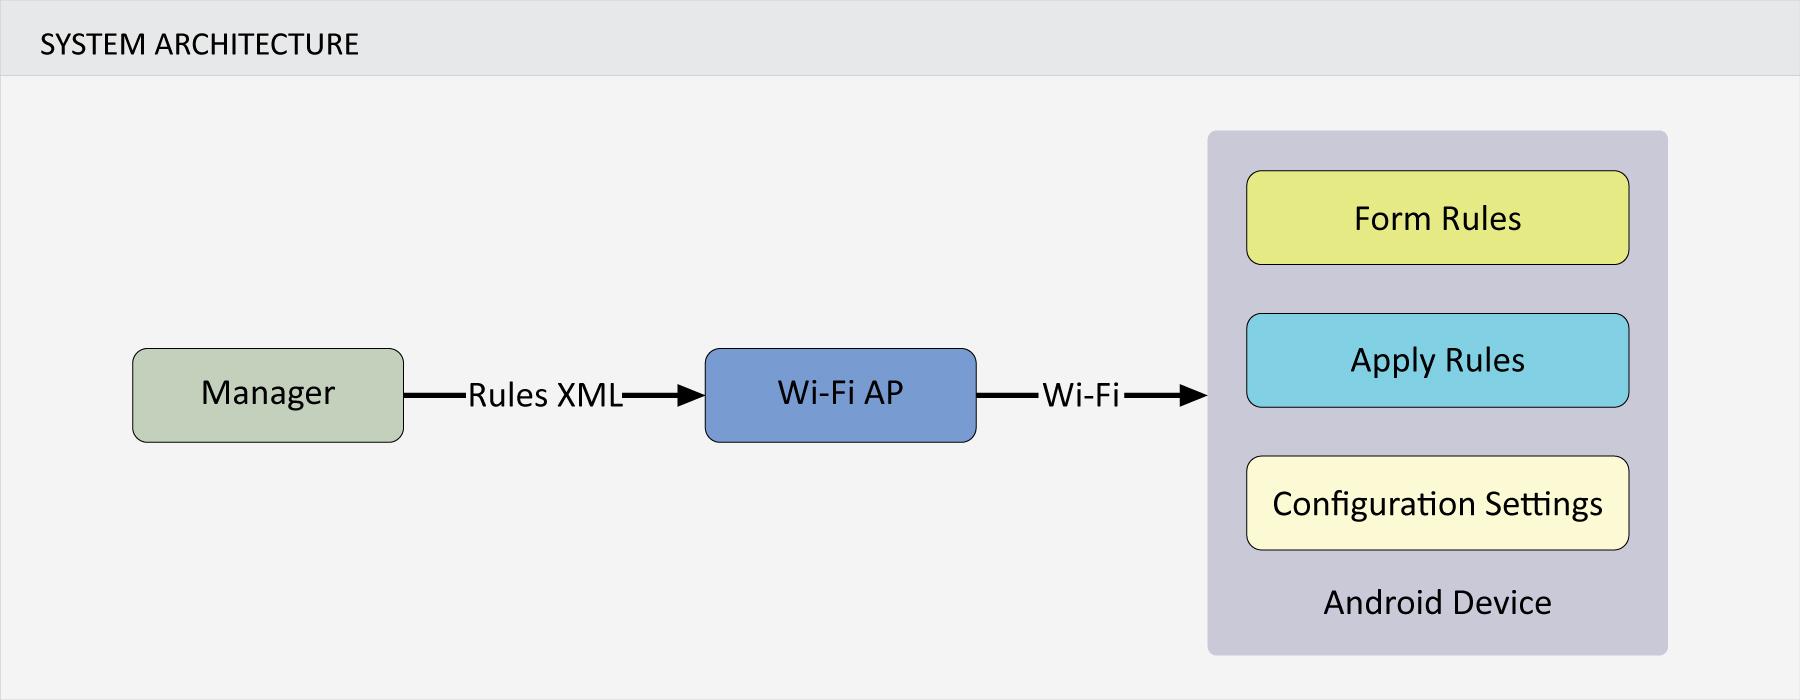 Uplink QoE - System Architecture